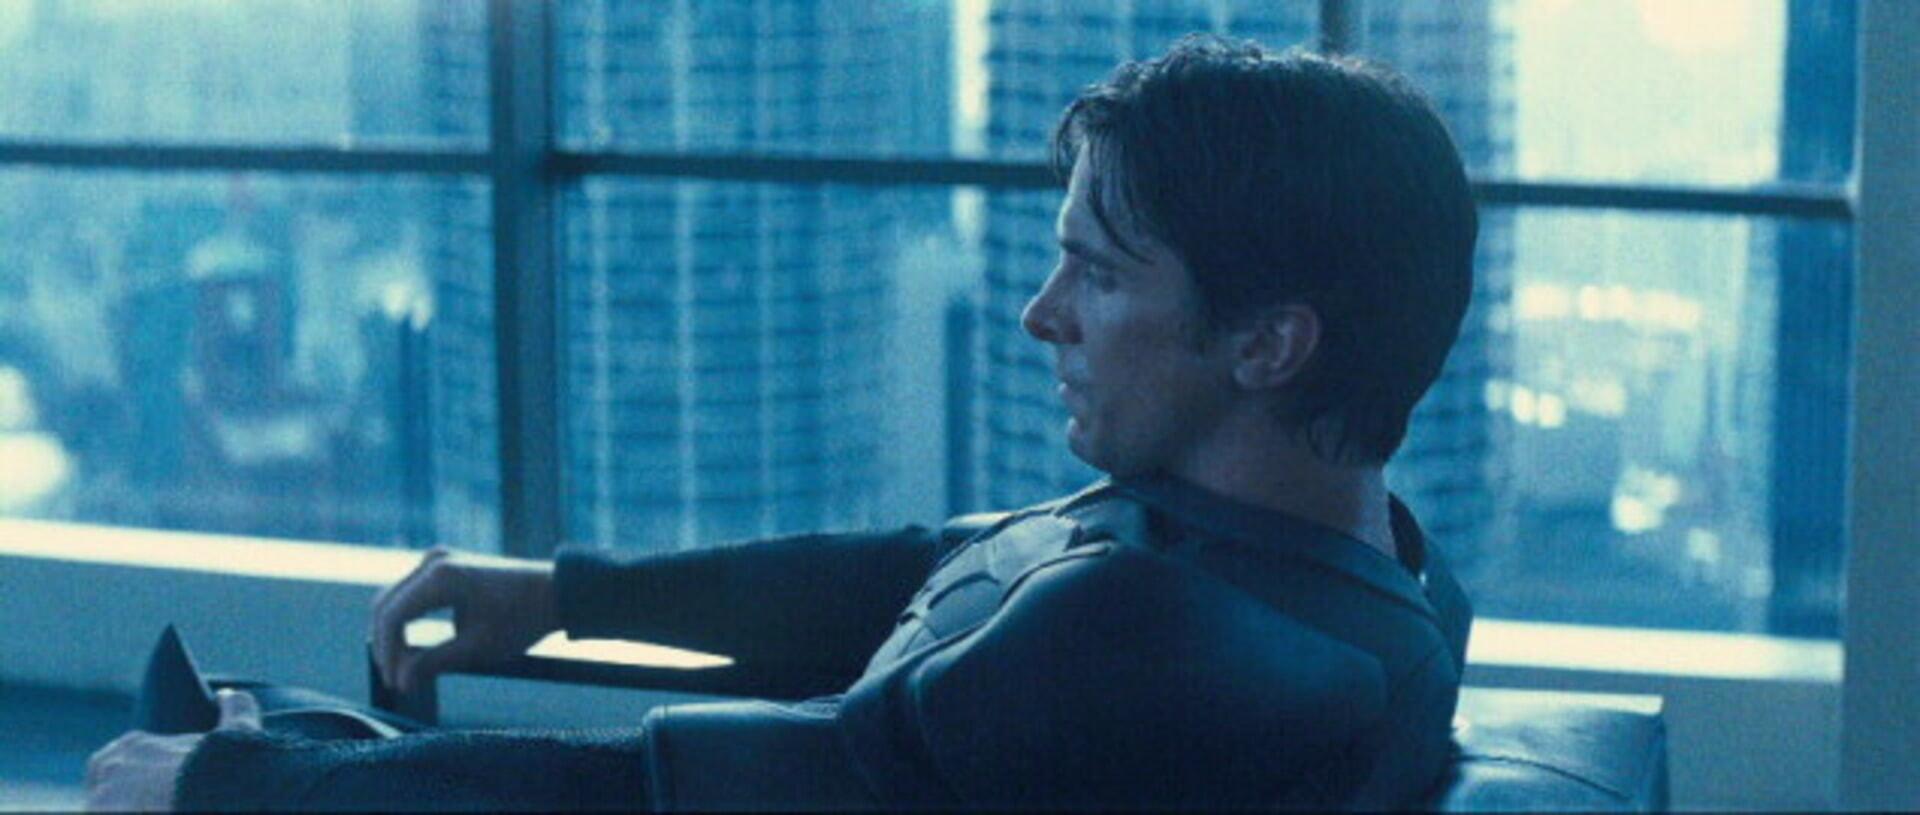 The Dark Knight - Image 26